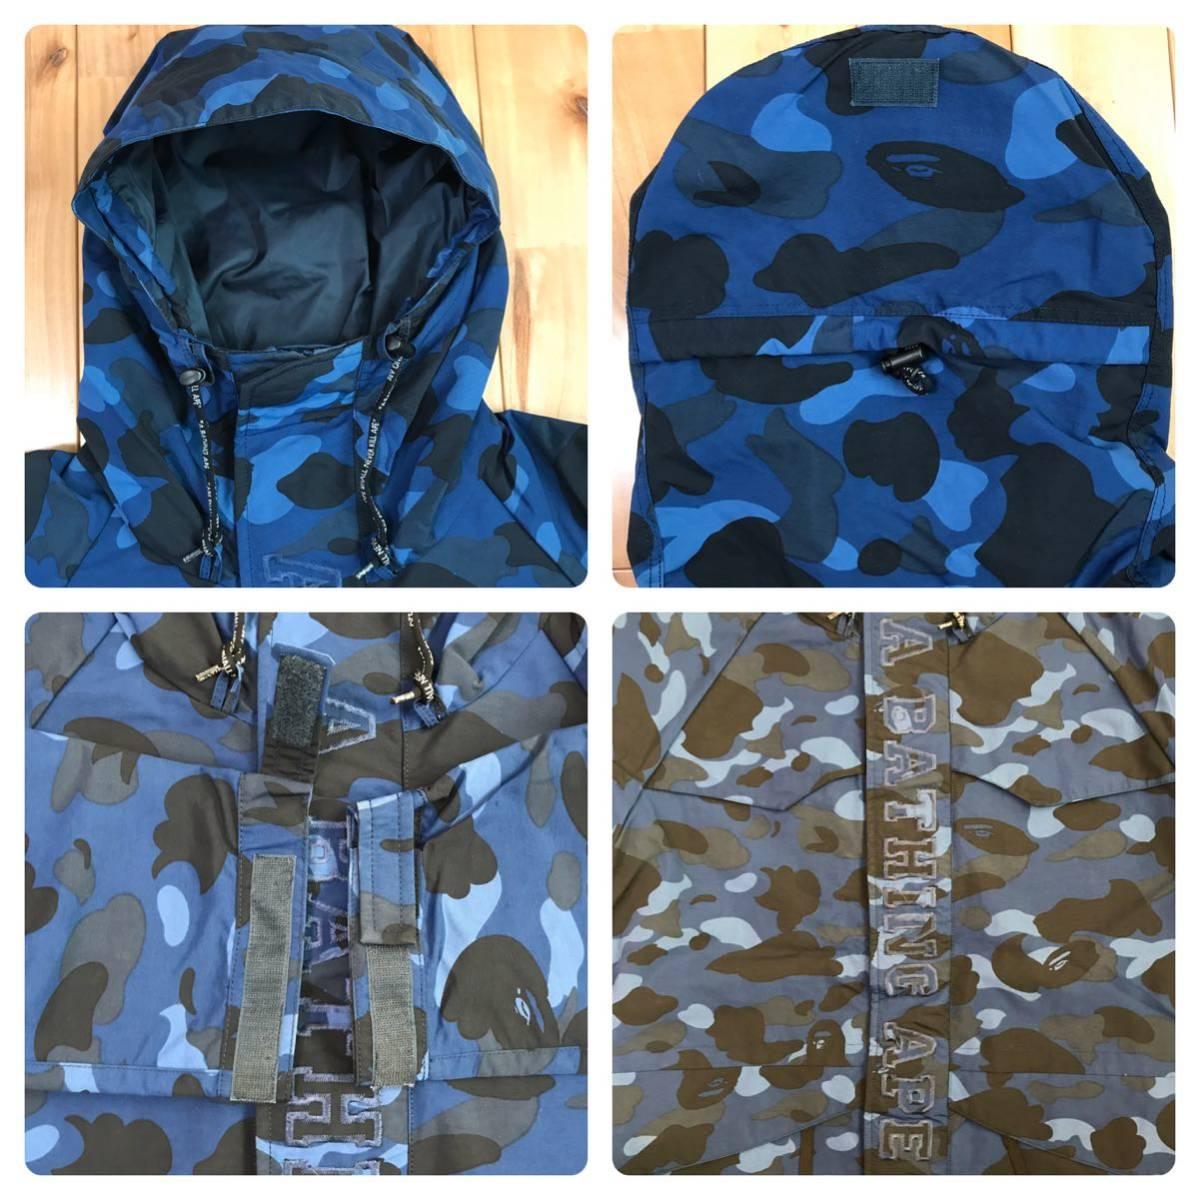 blue camo スノボジャケット Sサイズ a bathing ape BAPE snowboard jacket エイプ ベイプ アベイシングエイプ 迷彩 ブルーカモ 6852